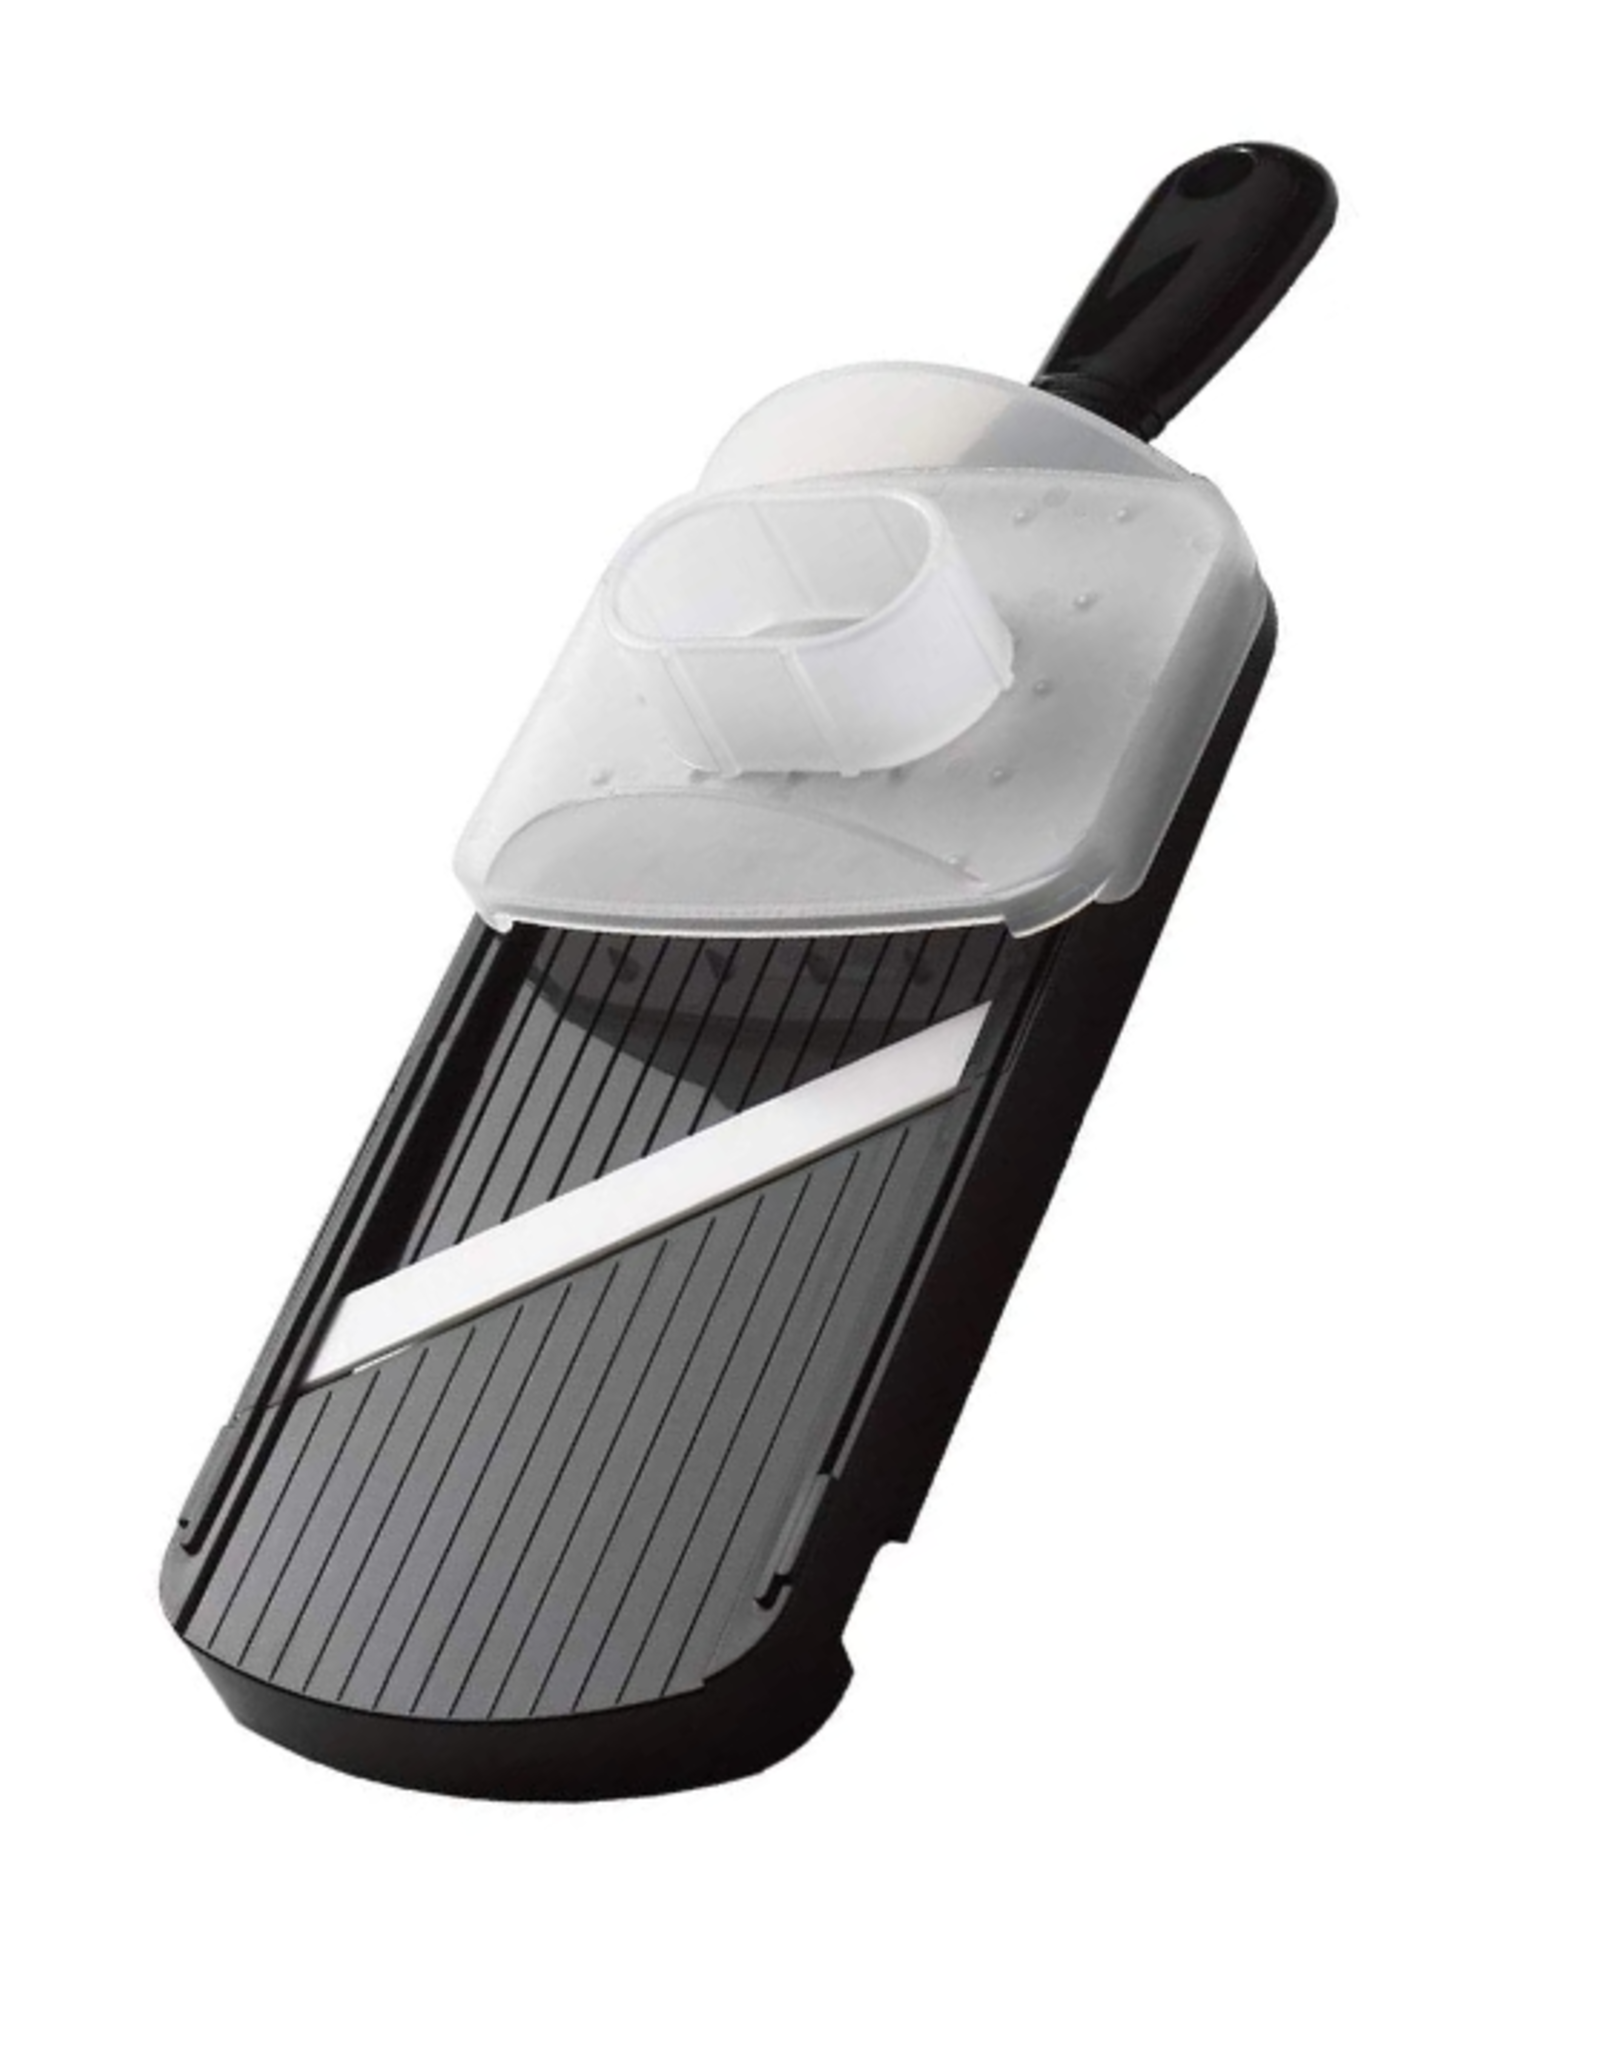 Kyocera Adjustable Mandoline, black